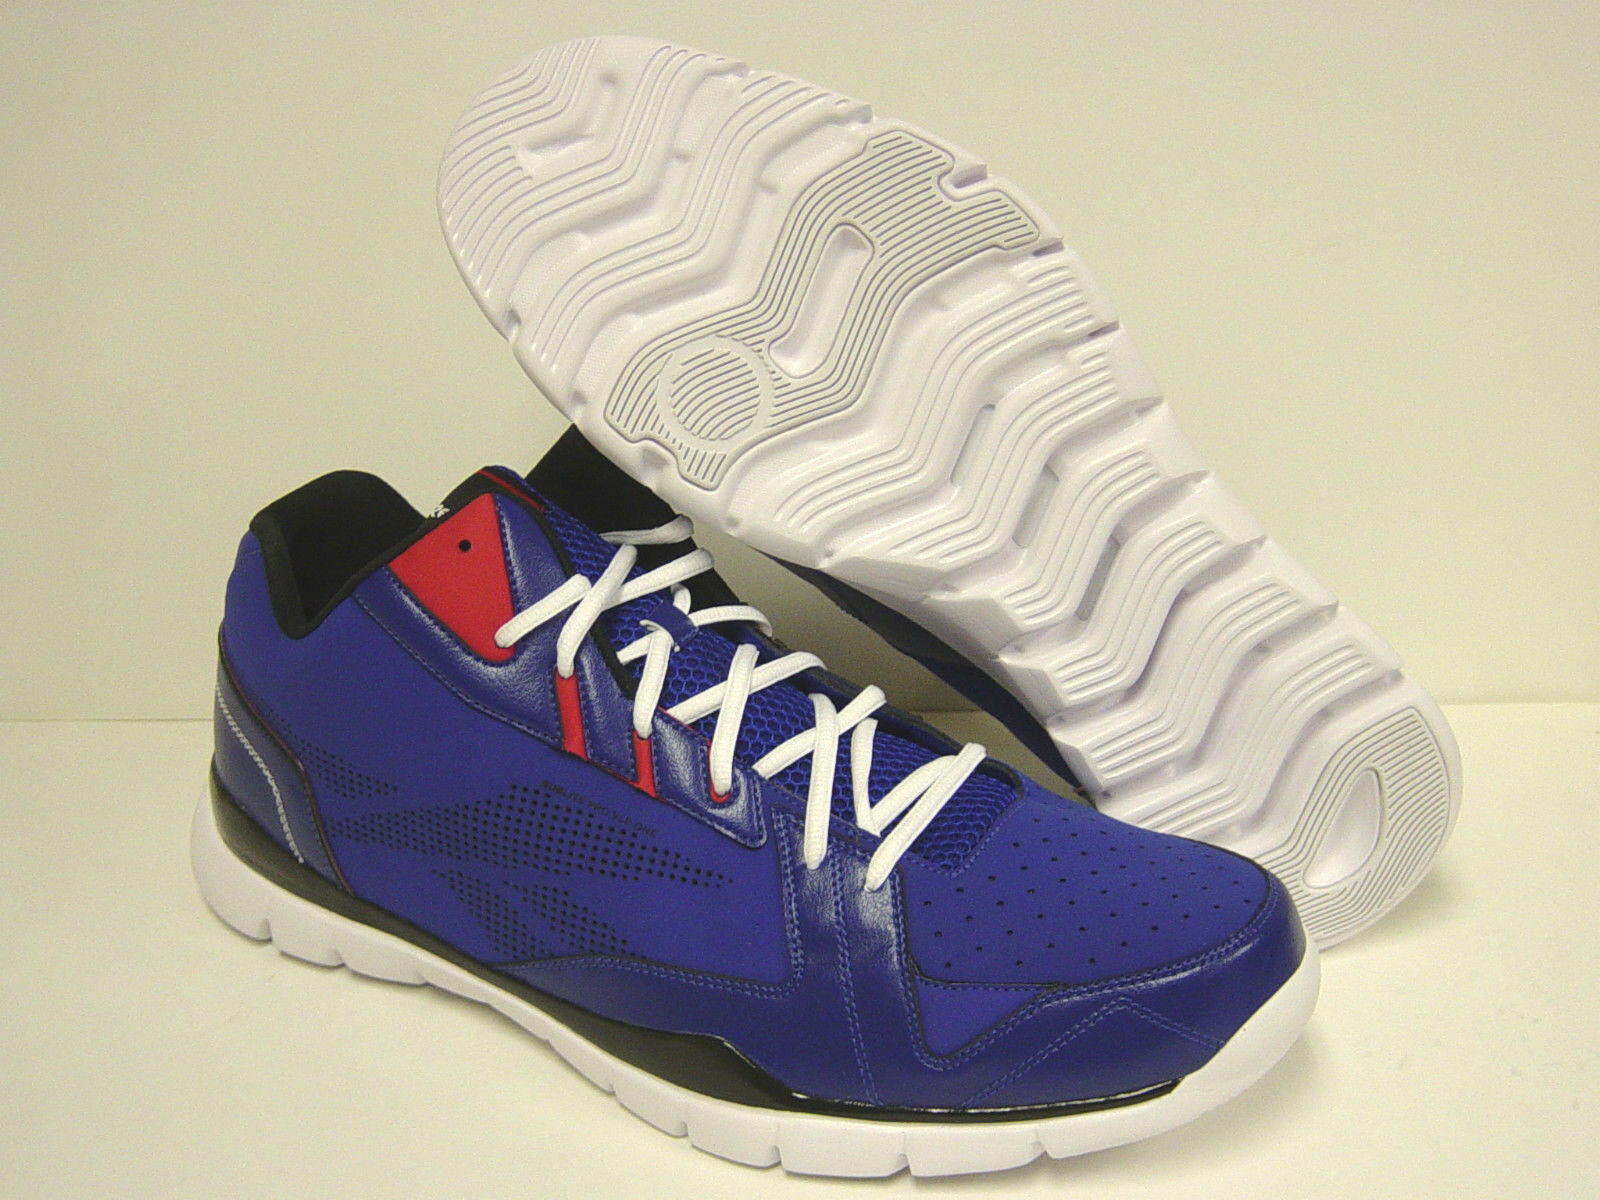 NEW Mens REEBOK SHOWDOWN SubLite VLP Rise Blue V44516 SAMPLE Sneakers Shoes